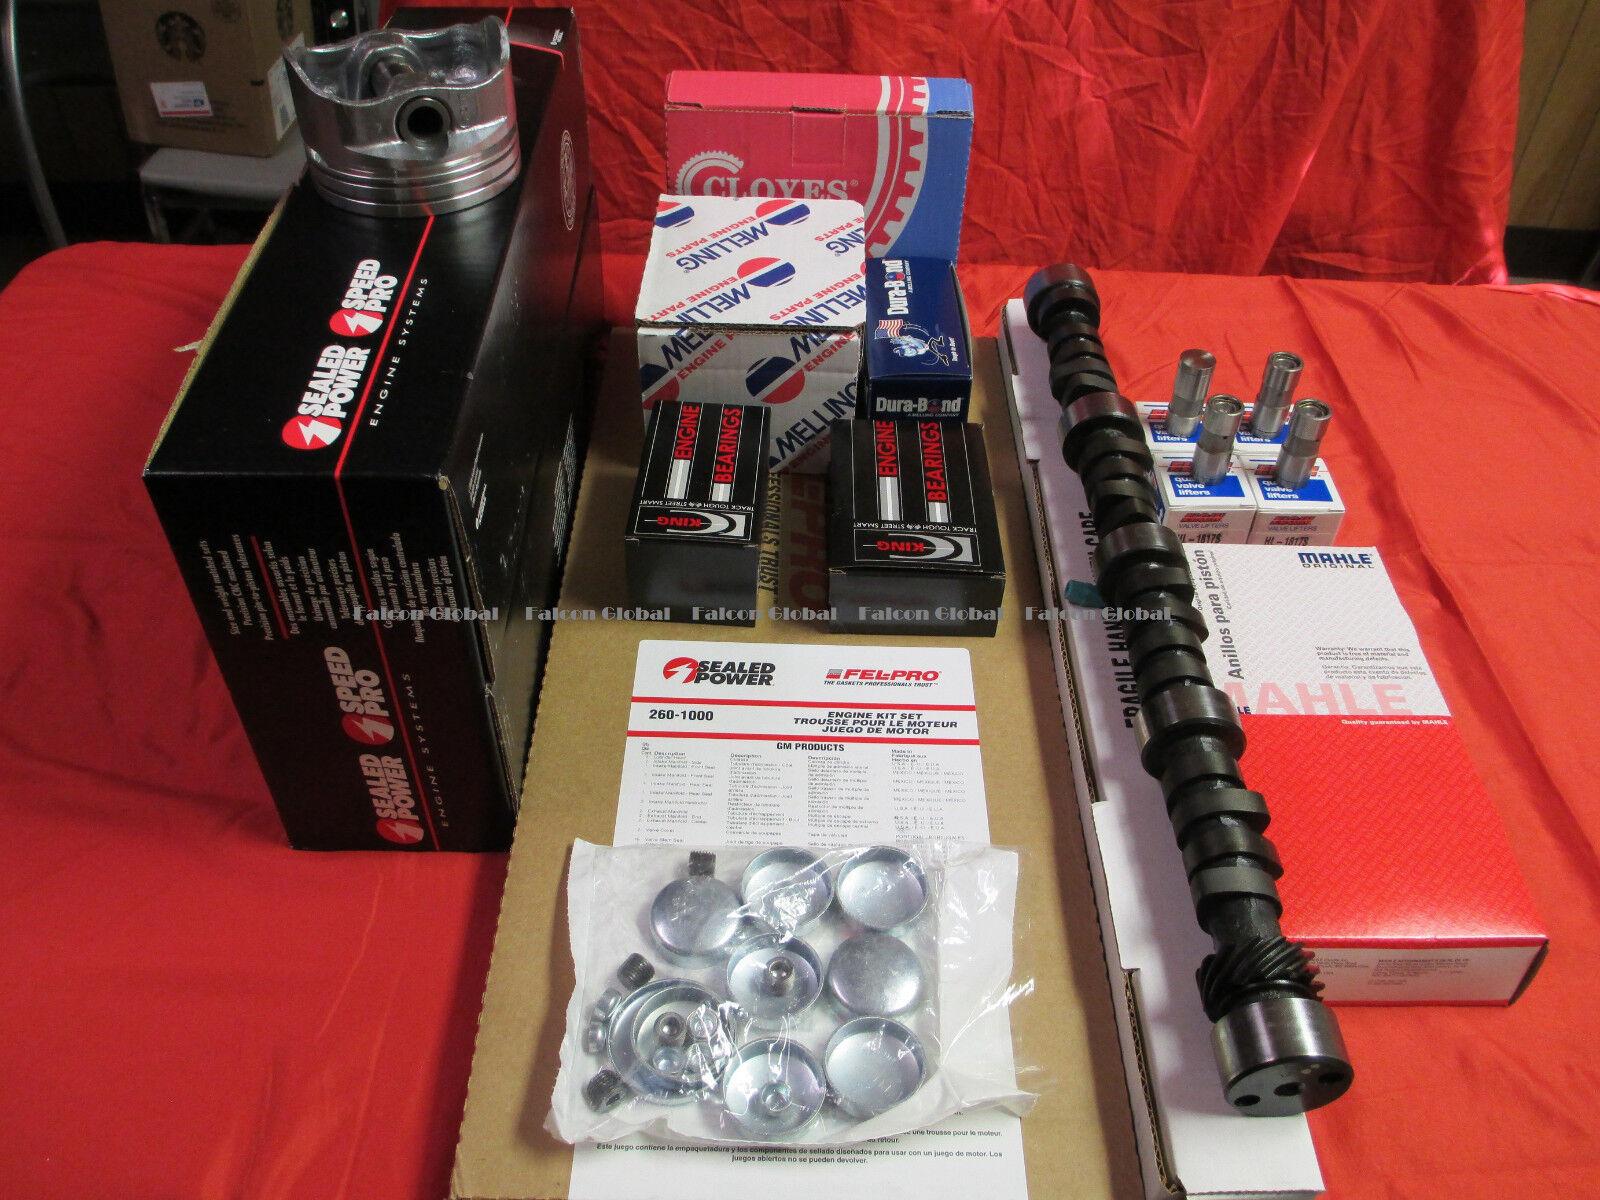 Mercury 429 re-ring engine kit 1971 1972 1968 1969 1970